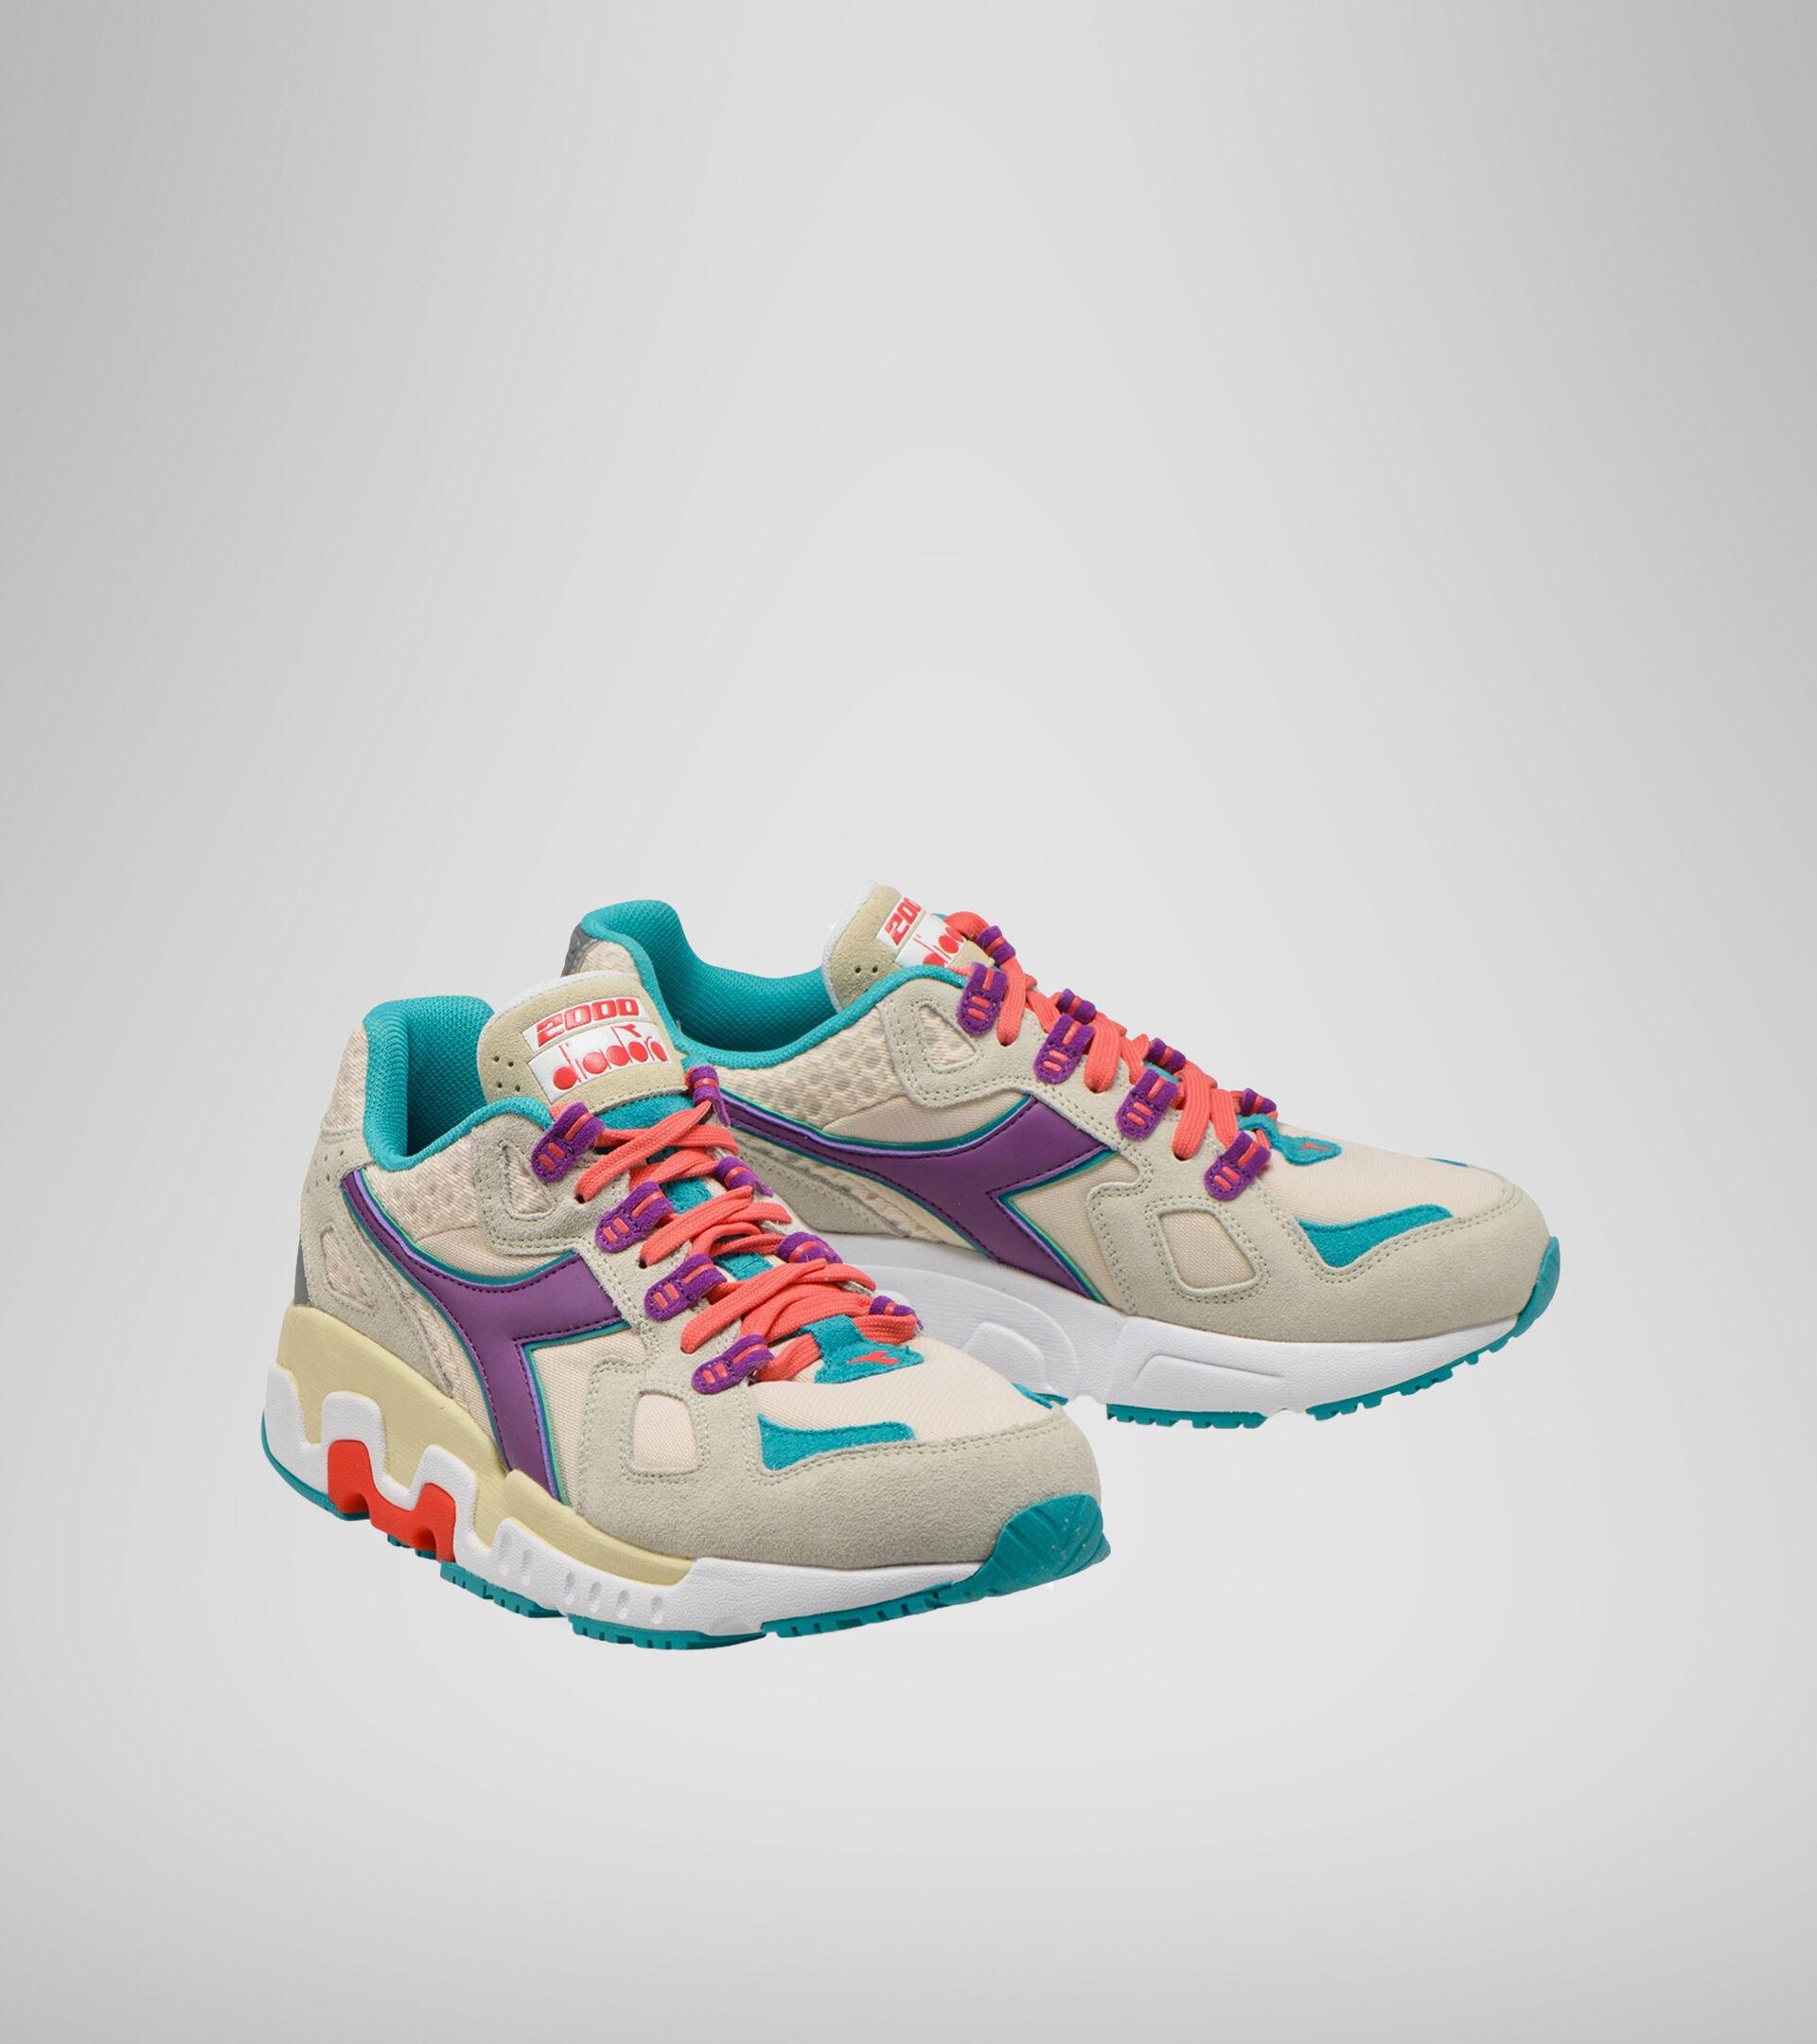 Footwear Sportswear UOMO MYTHOS OUTDOOR BEIGE OSTRICA Diadora